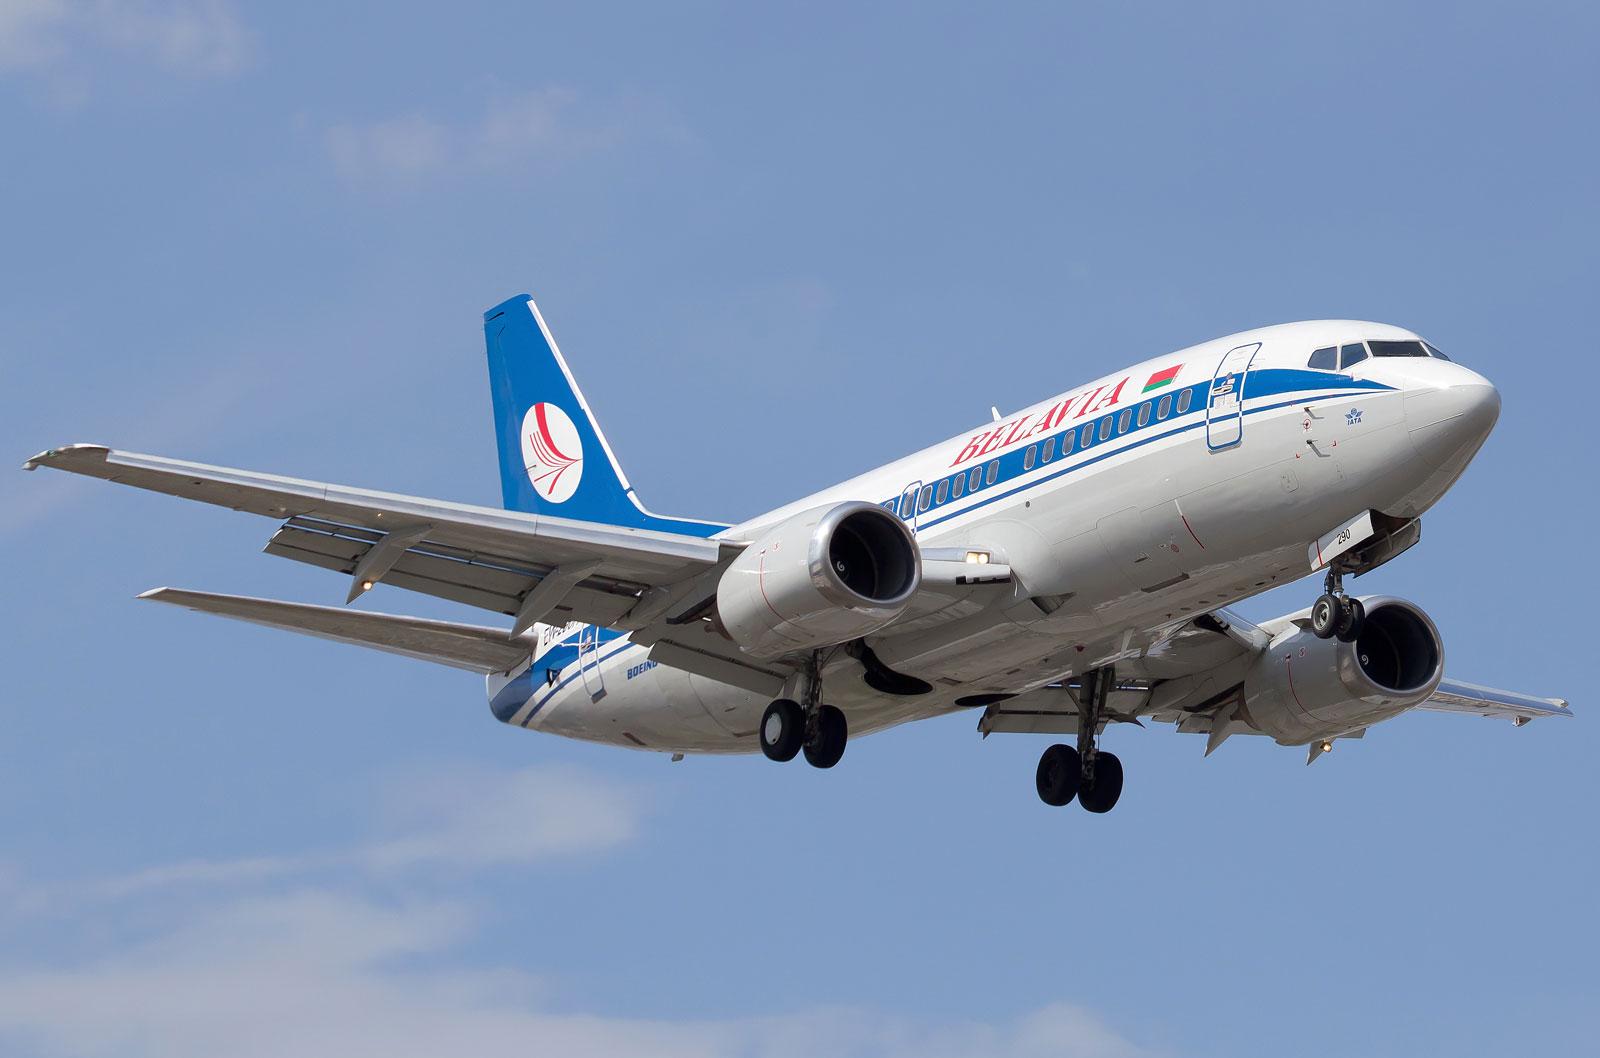 Boeing 737 500 боинг 737 500 — белавиа